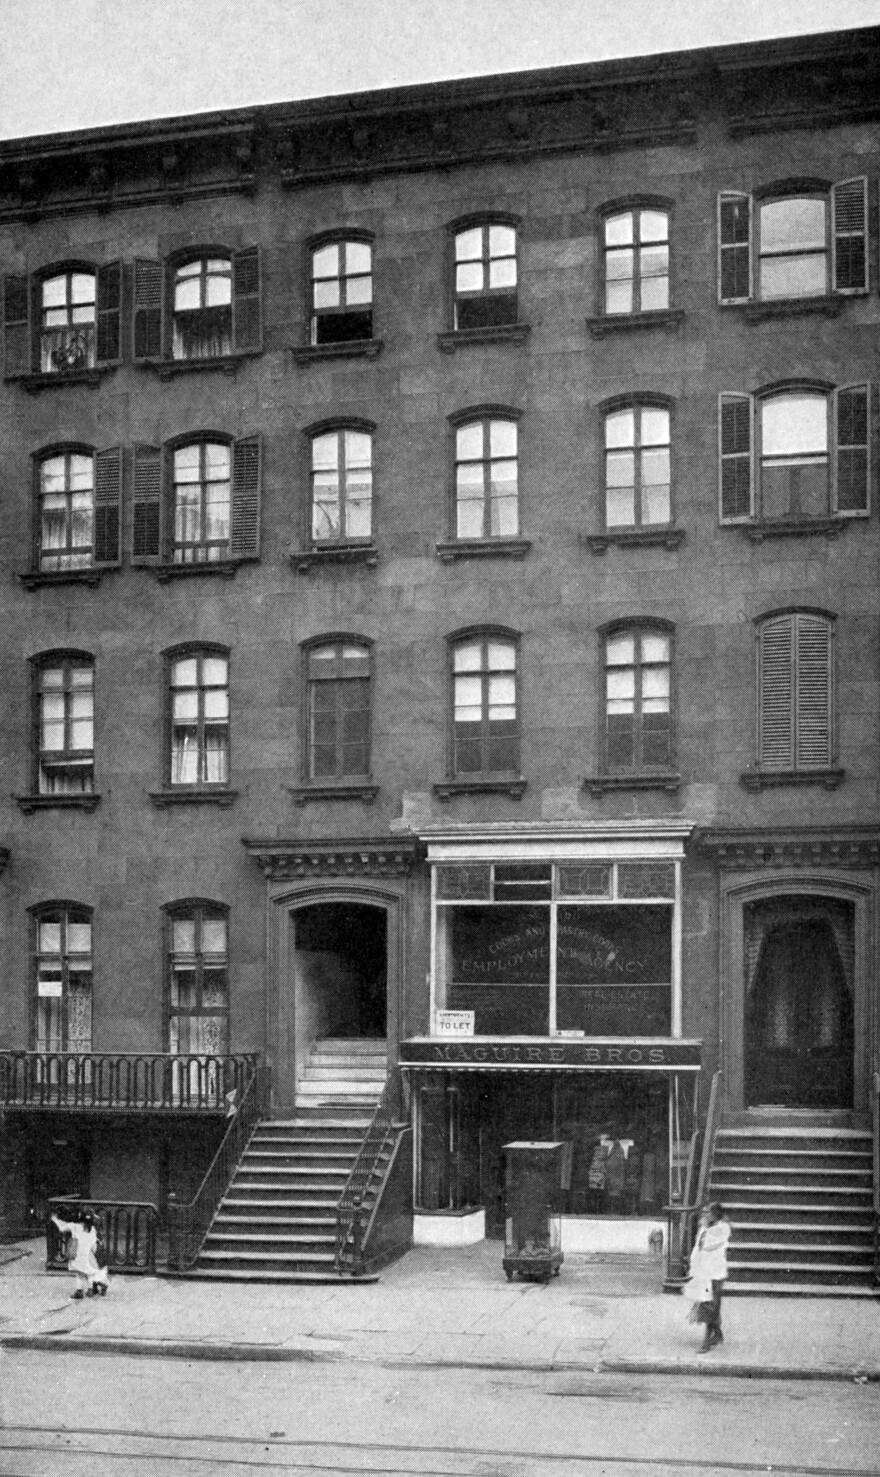 Former home of Chester A. Arthur, 123 Lexington Ave., New York City.